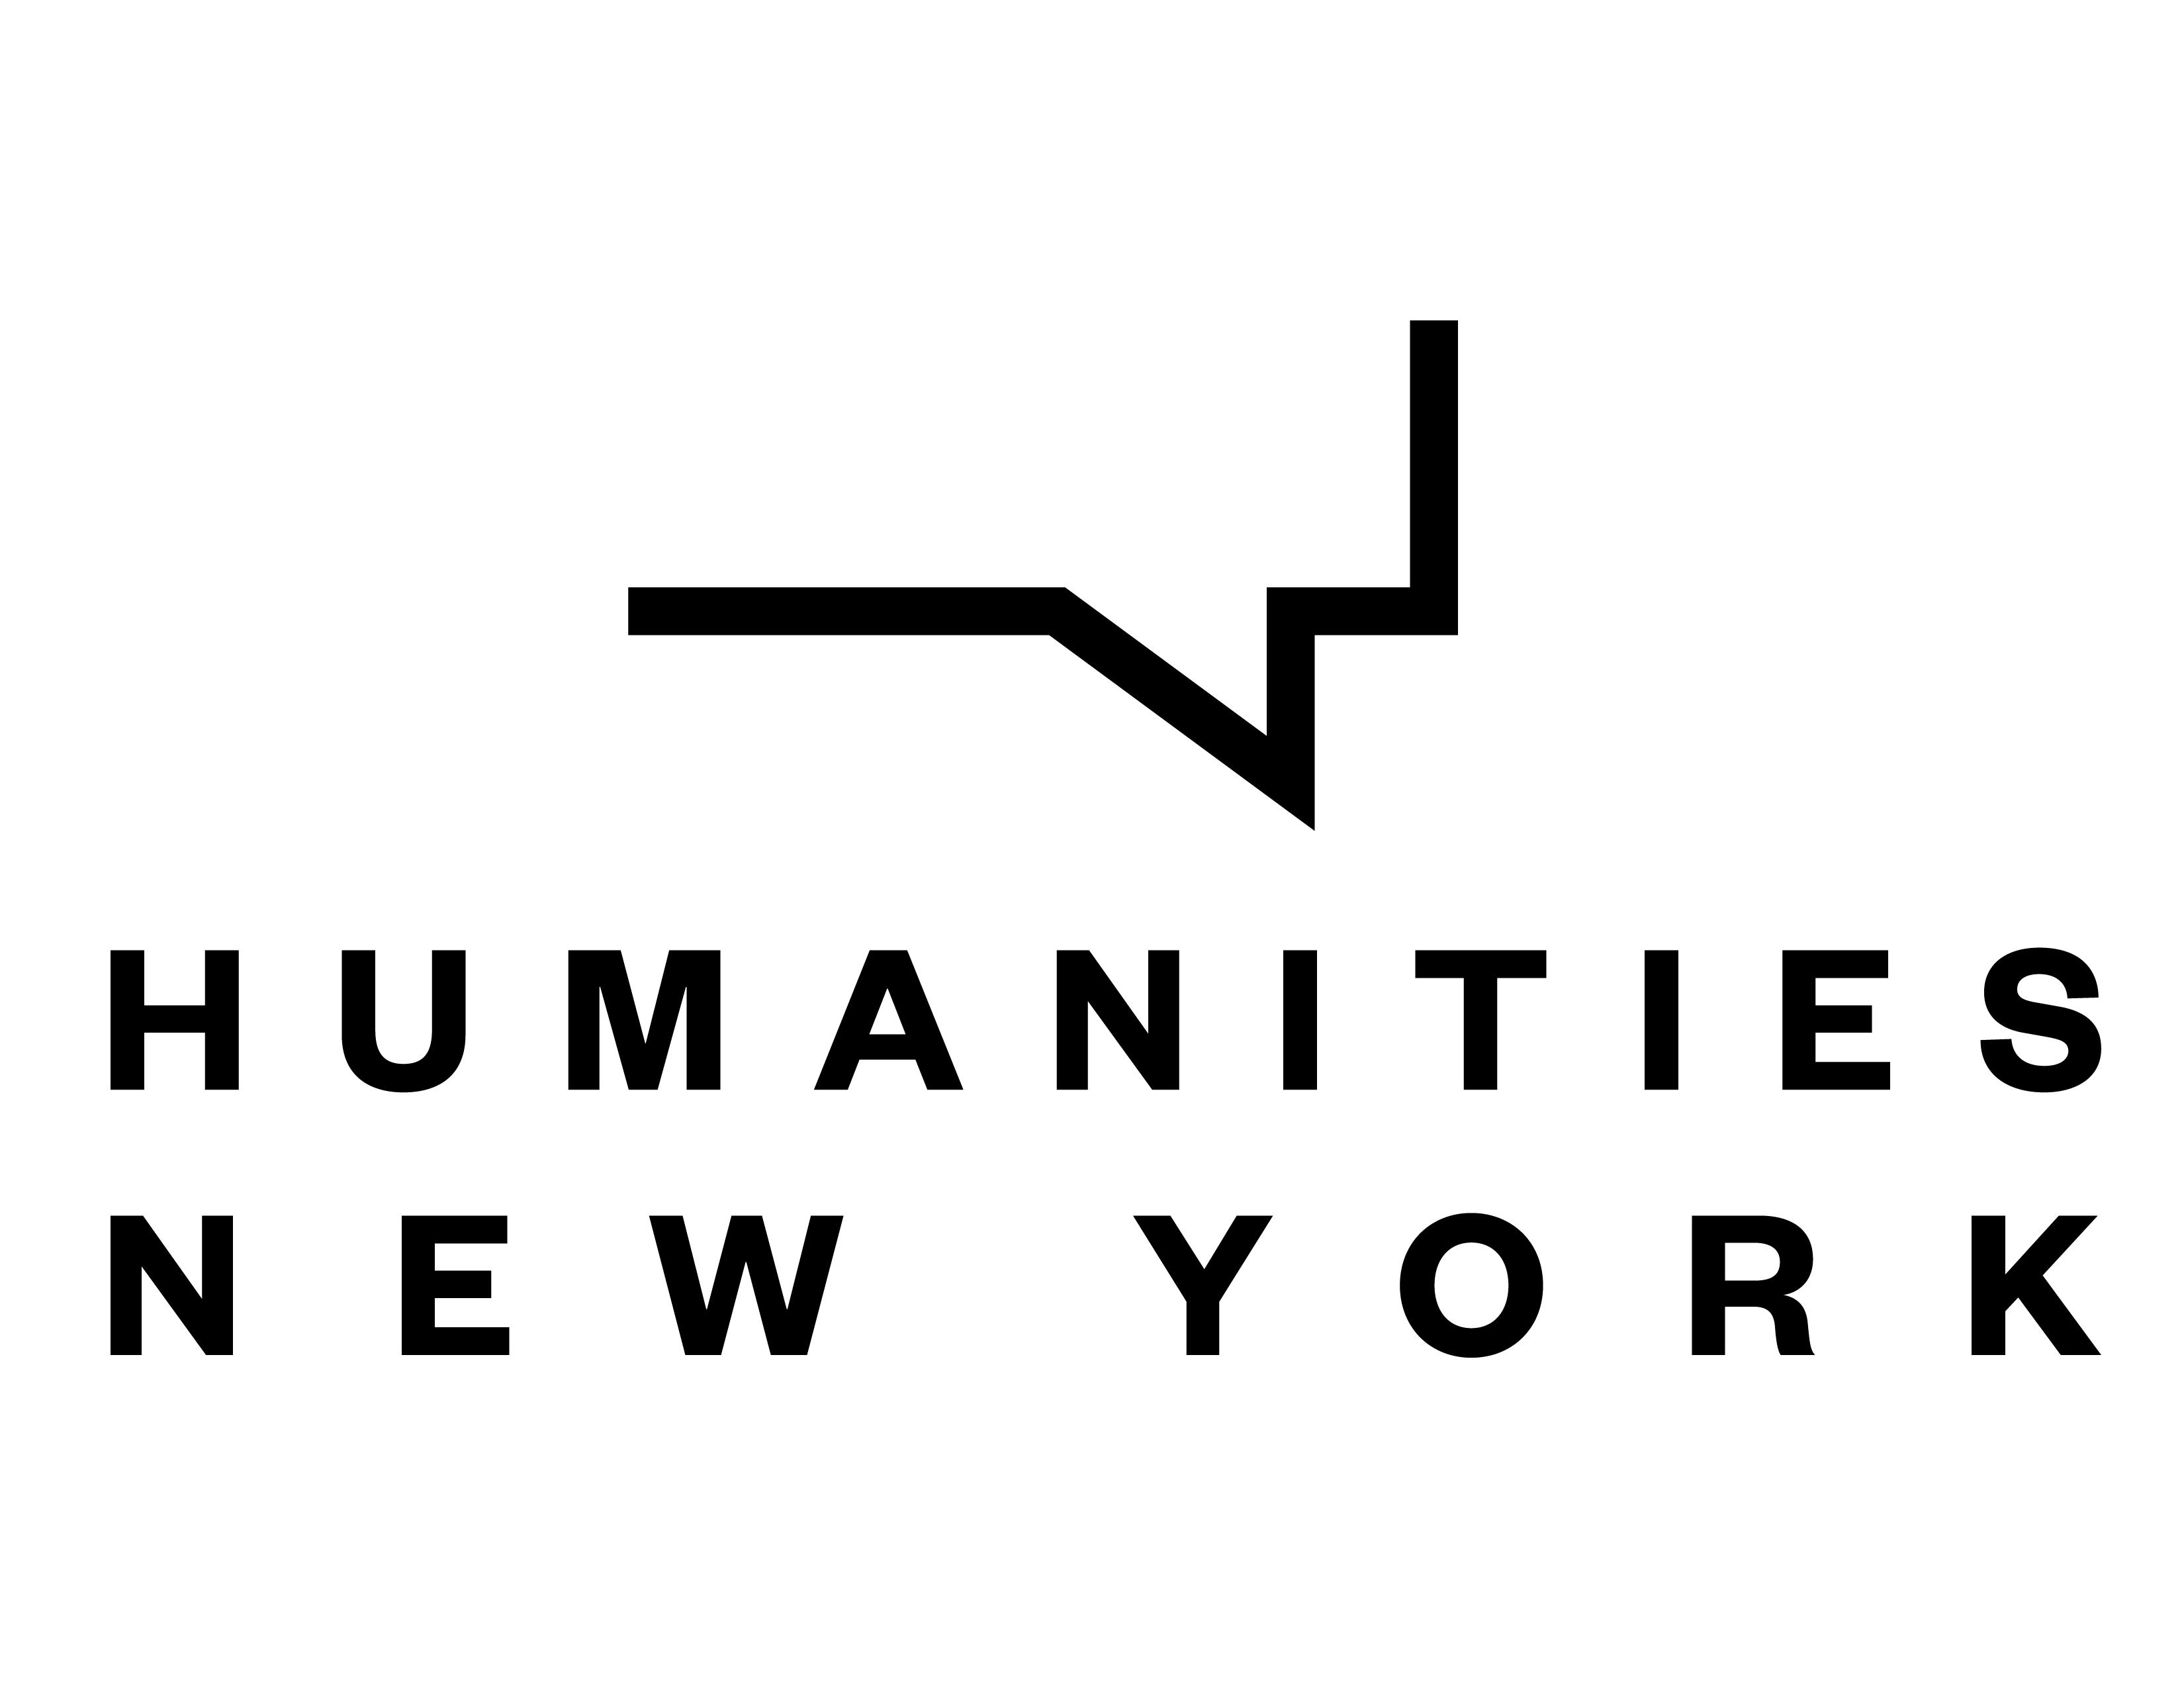 Humanities New York